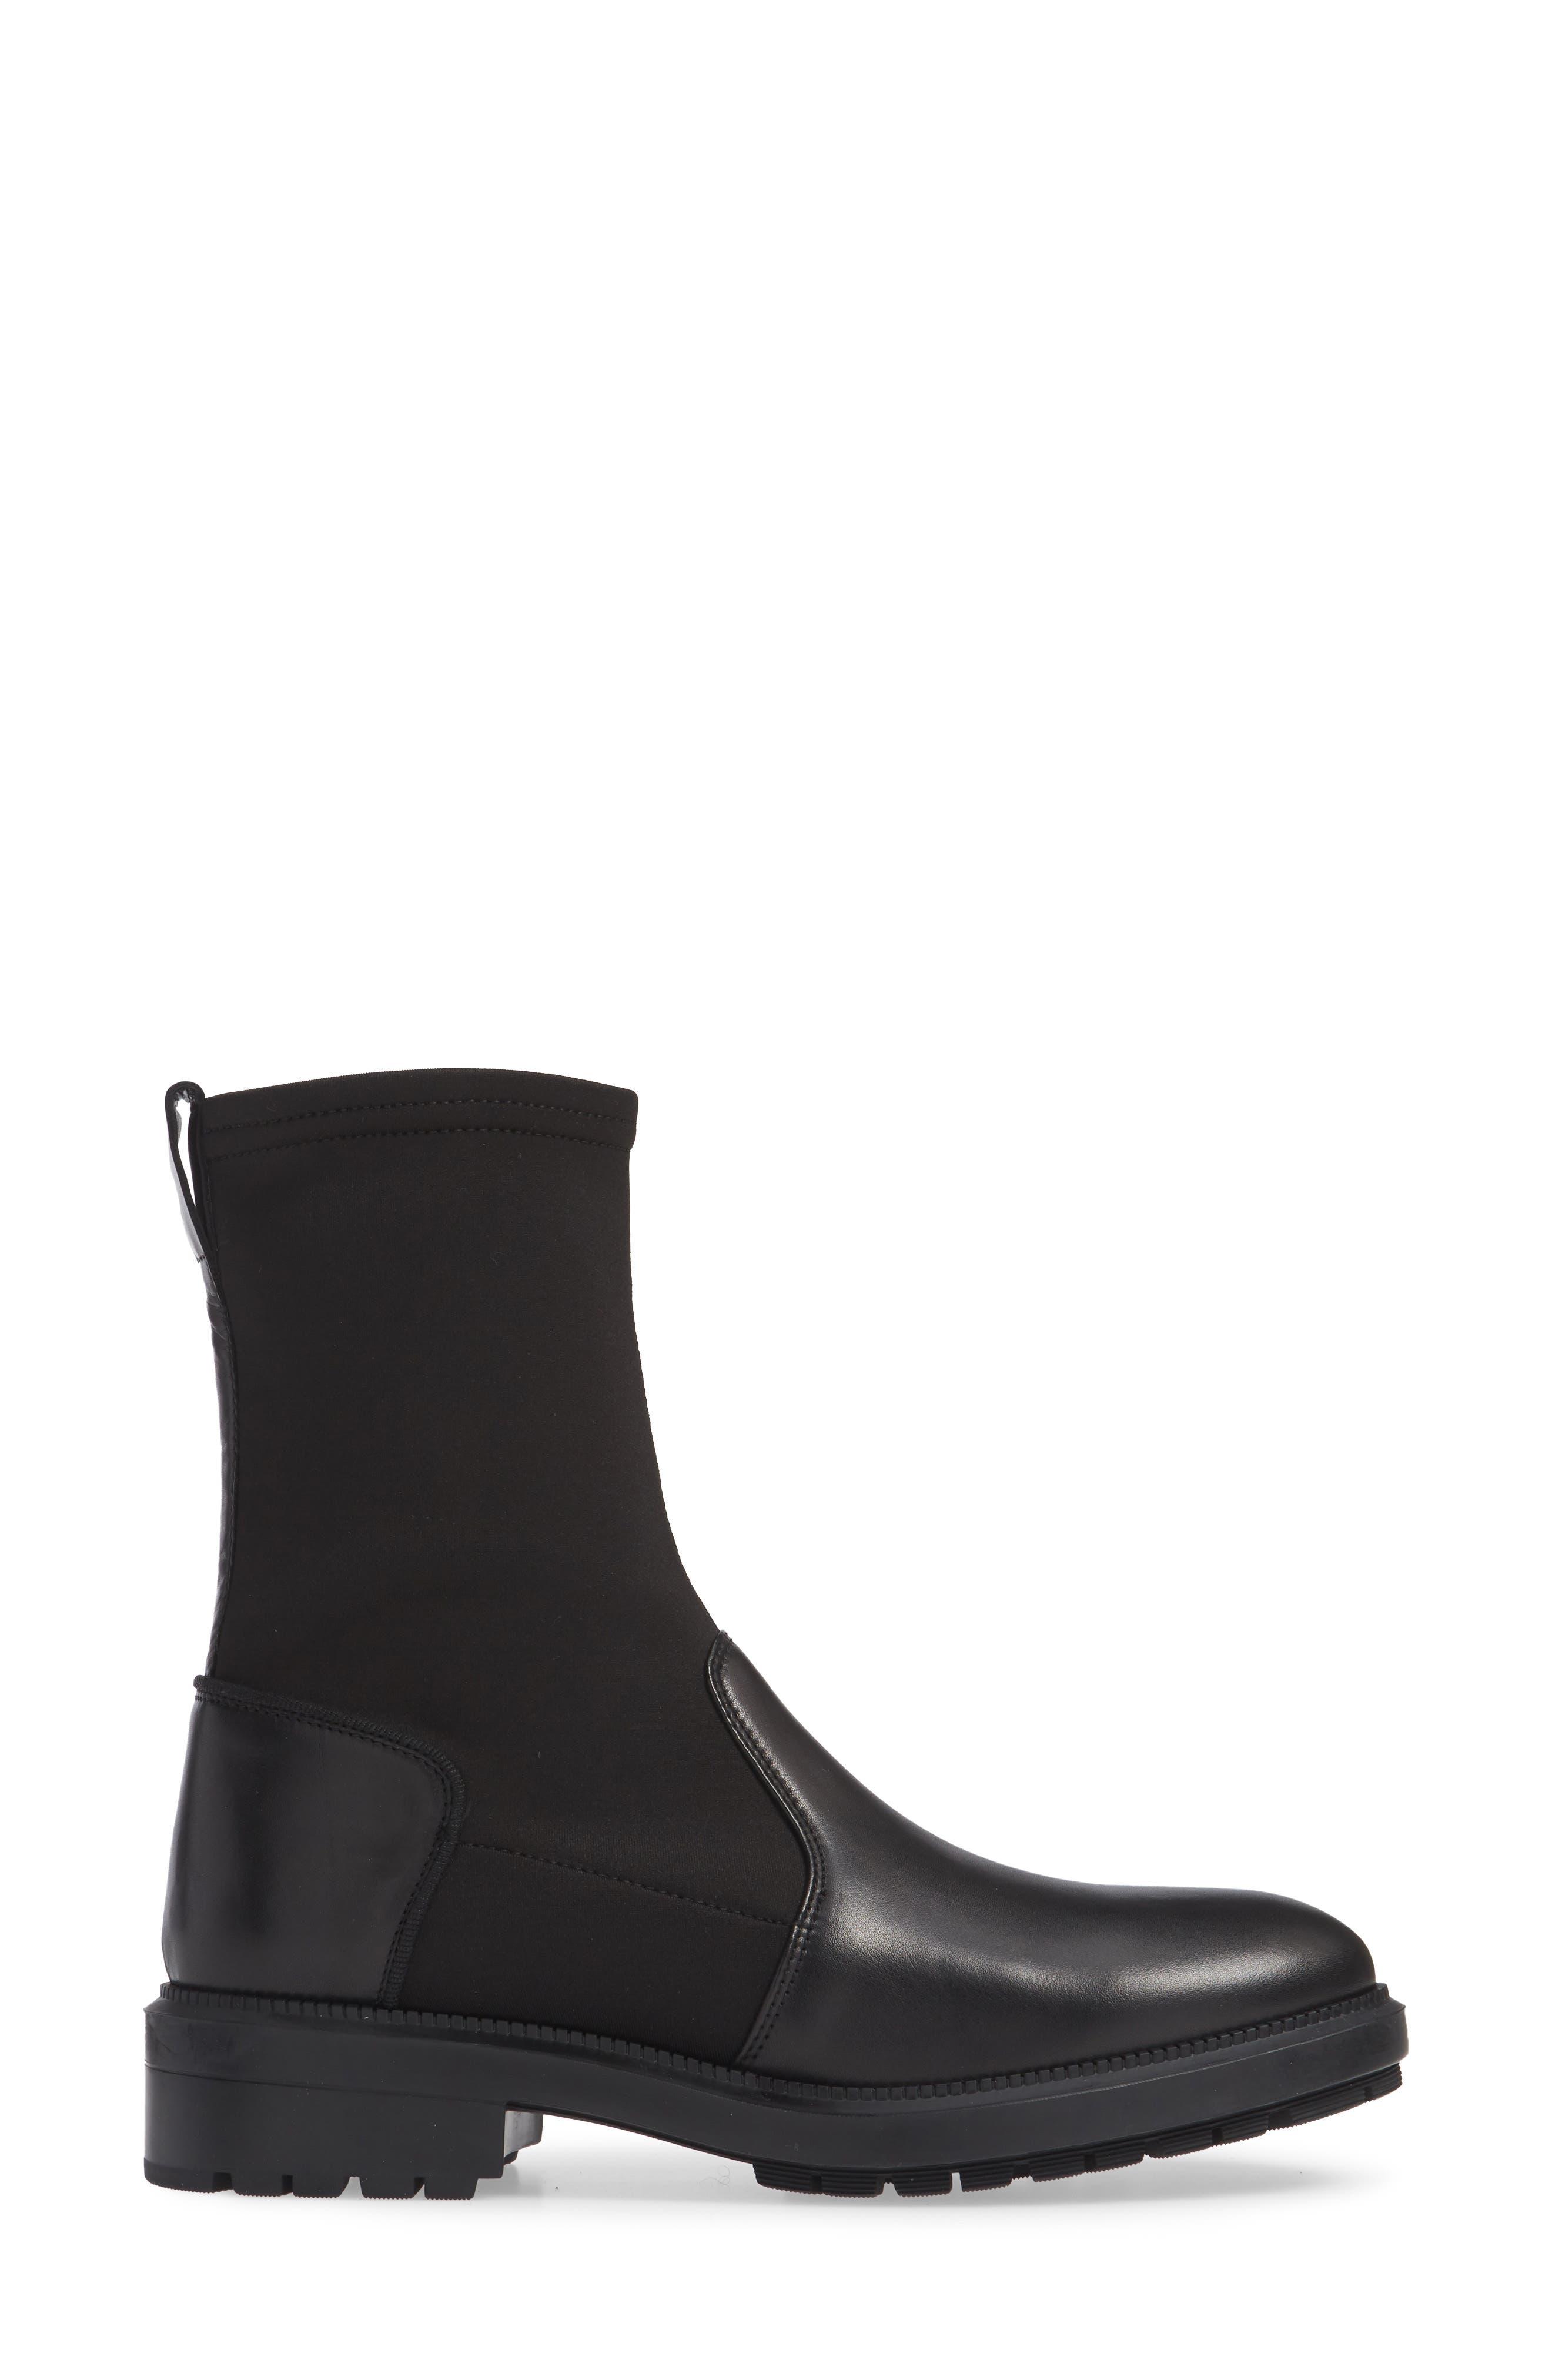 Leoda Ankle Boot,                             Alternate thumbnail 3, color,                             BLACK